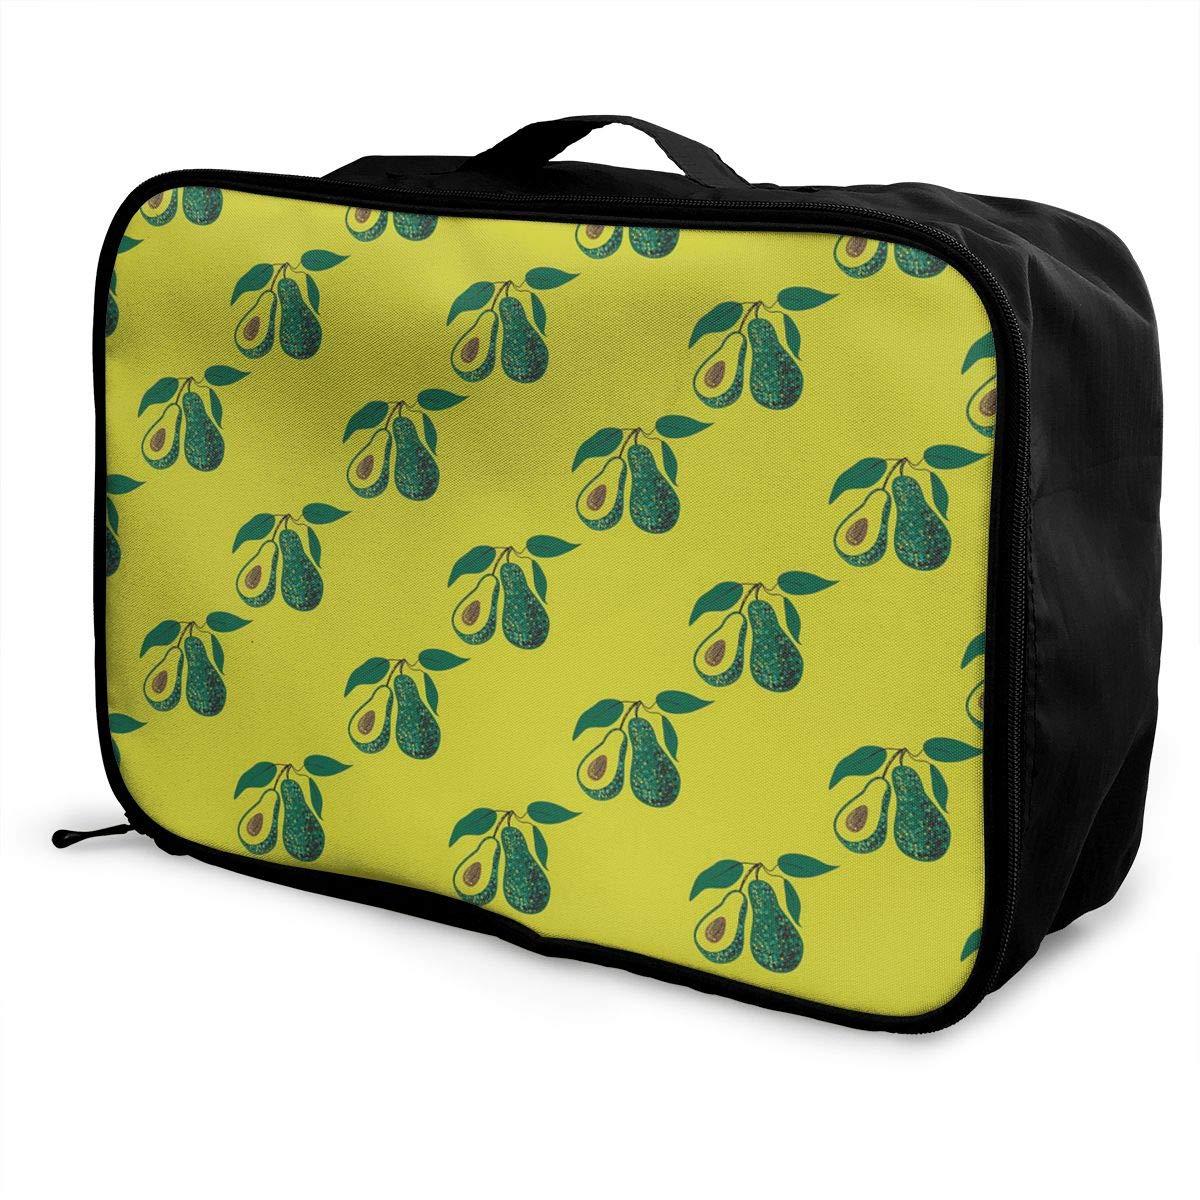 Women /& Men Foldable Travel Duffel Bag Pink Avocado Pattern For Luggage Gym Sports